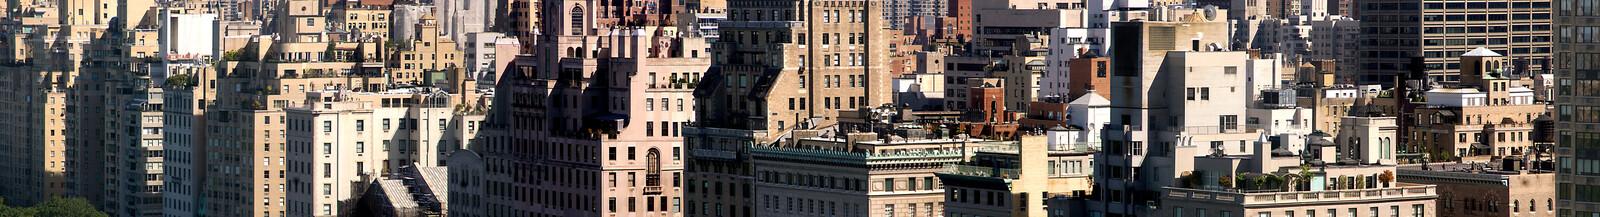 Fifth Avenue #2, New York, USA - Larry Yust